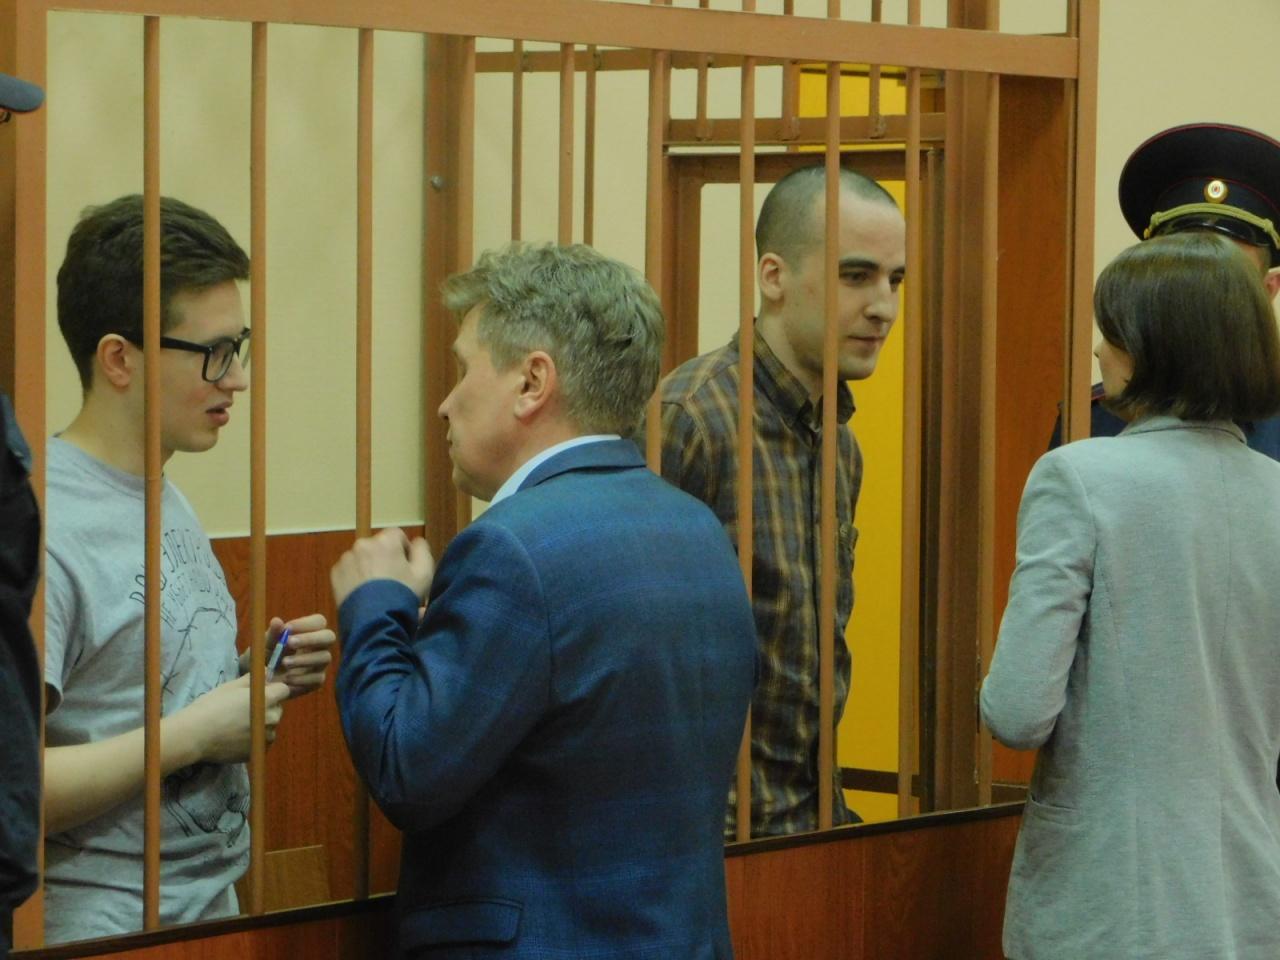 фото ЗакС политика Петербургским фигурантам дела «Сети»* продлили арест до 11 сентября